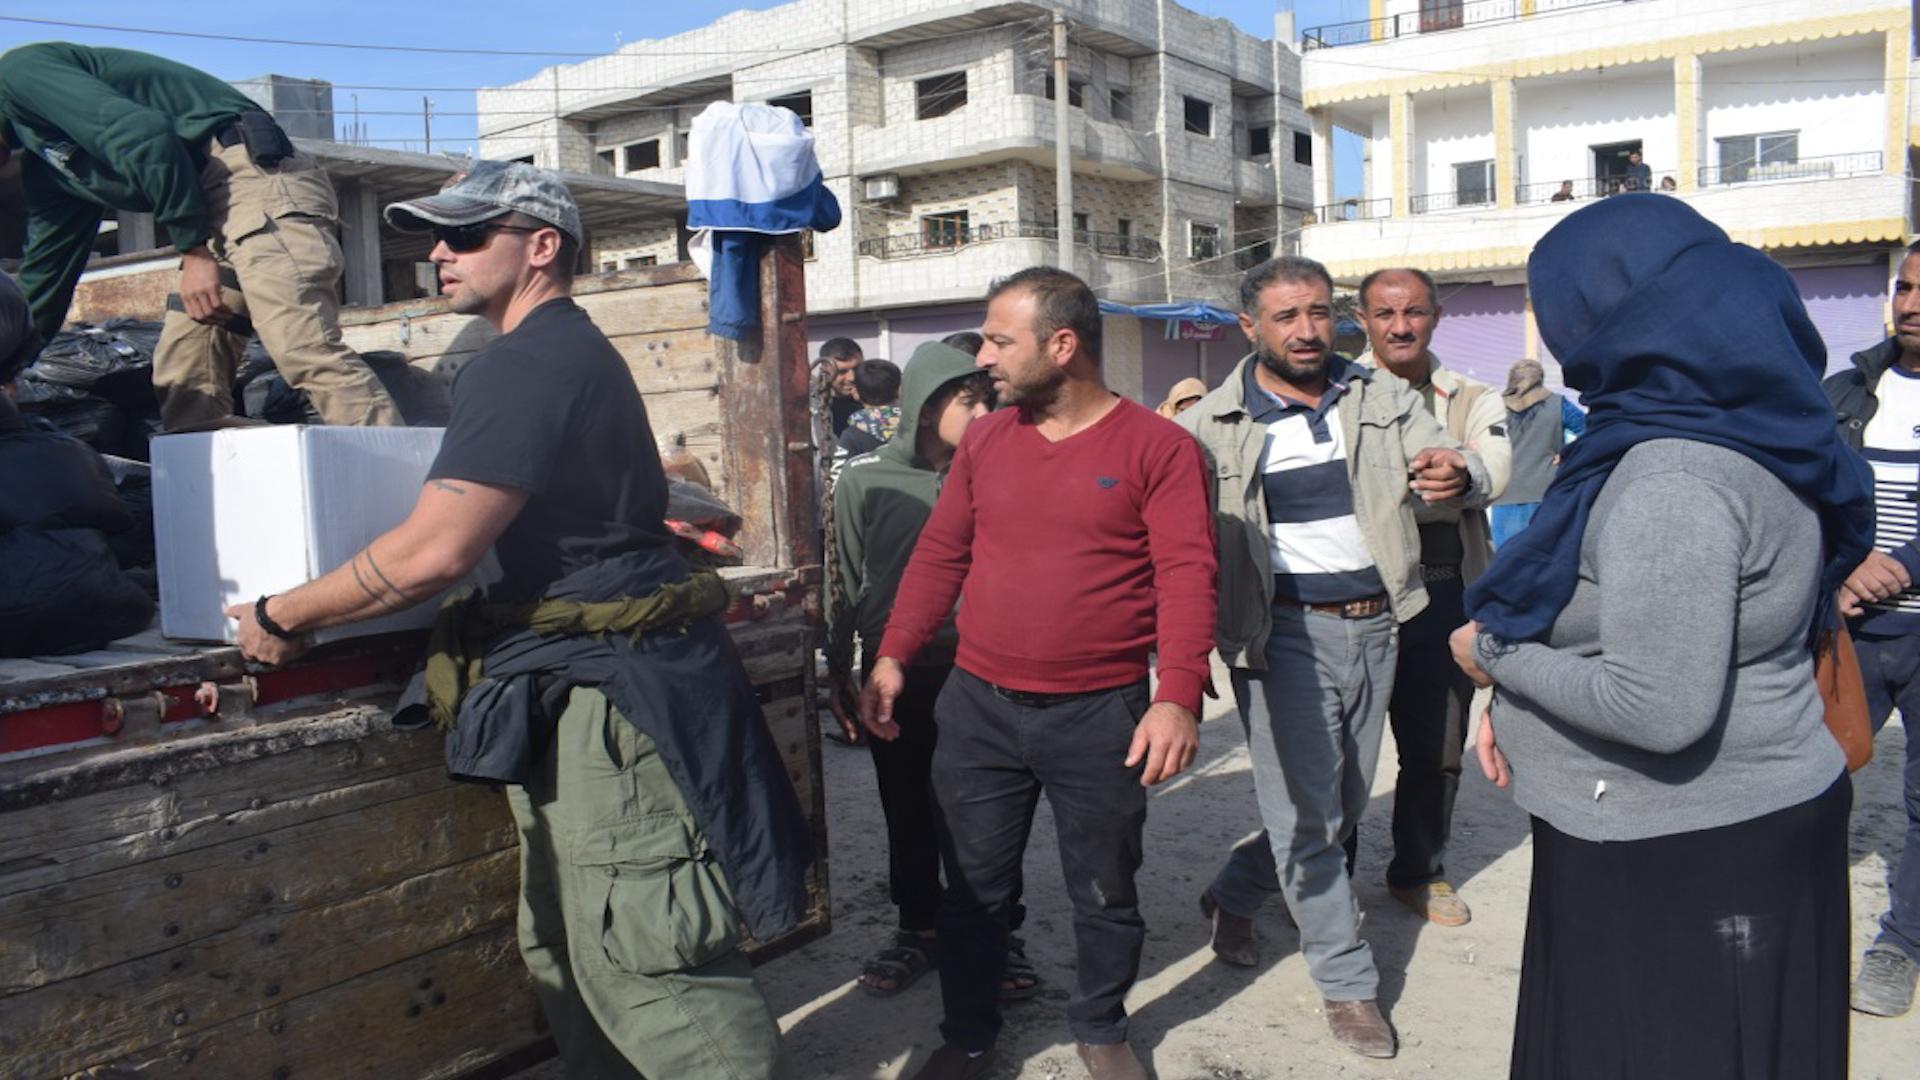 Photo of نحو 1050 عائلة نازحة في كوباني والإدارة الذّاتيّة تبذل قصارى جهدها لمساعدتهم